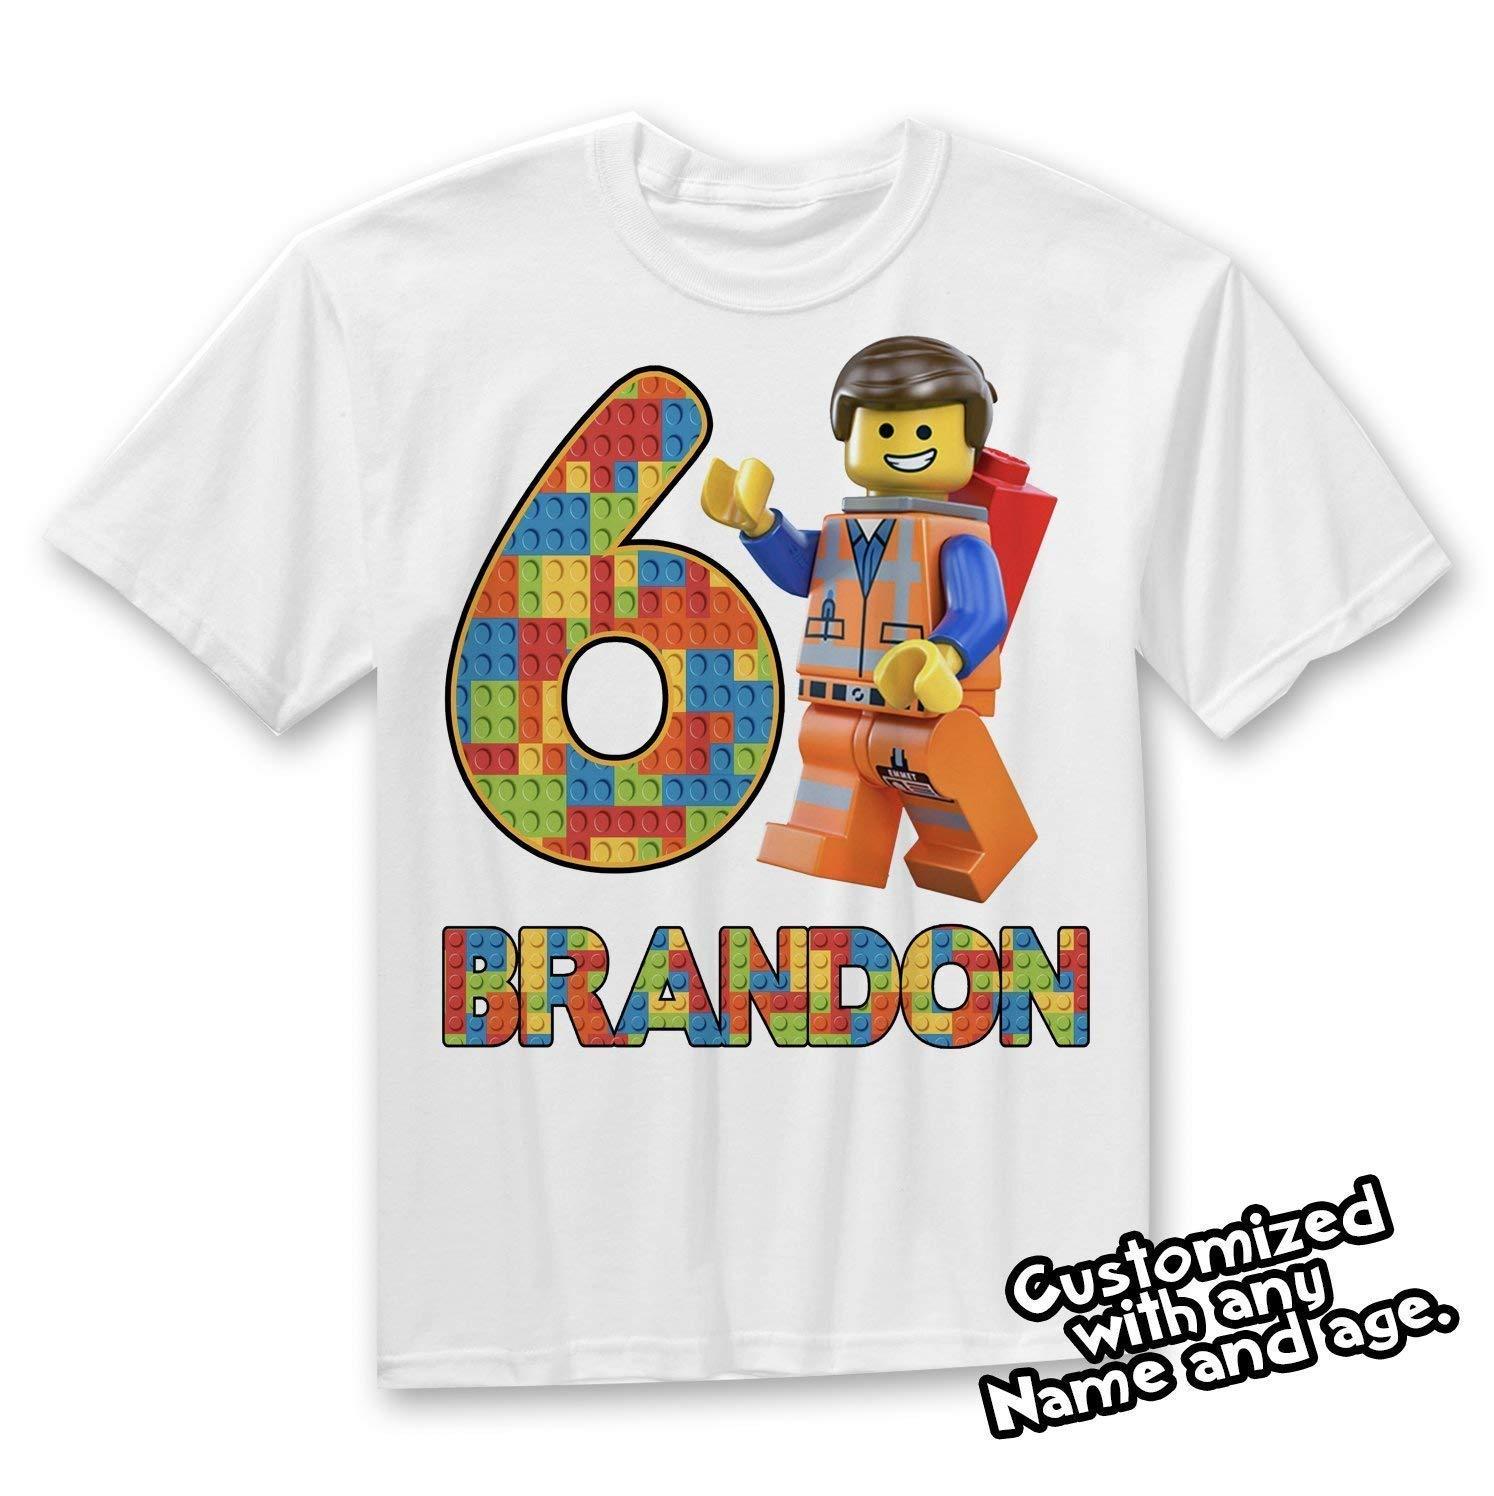 Lego Birthday Shirt, Lego Theme party shirt, Lego Party gift